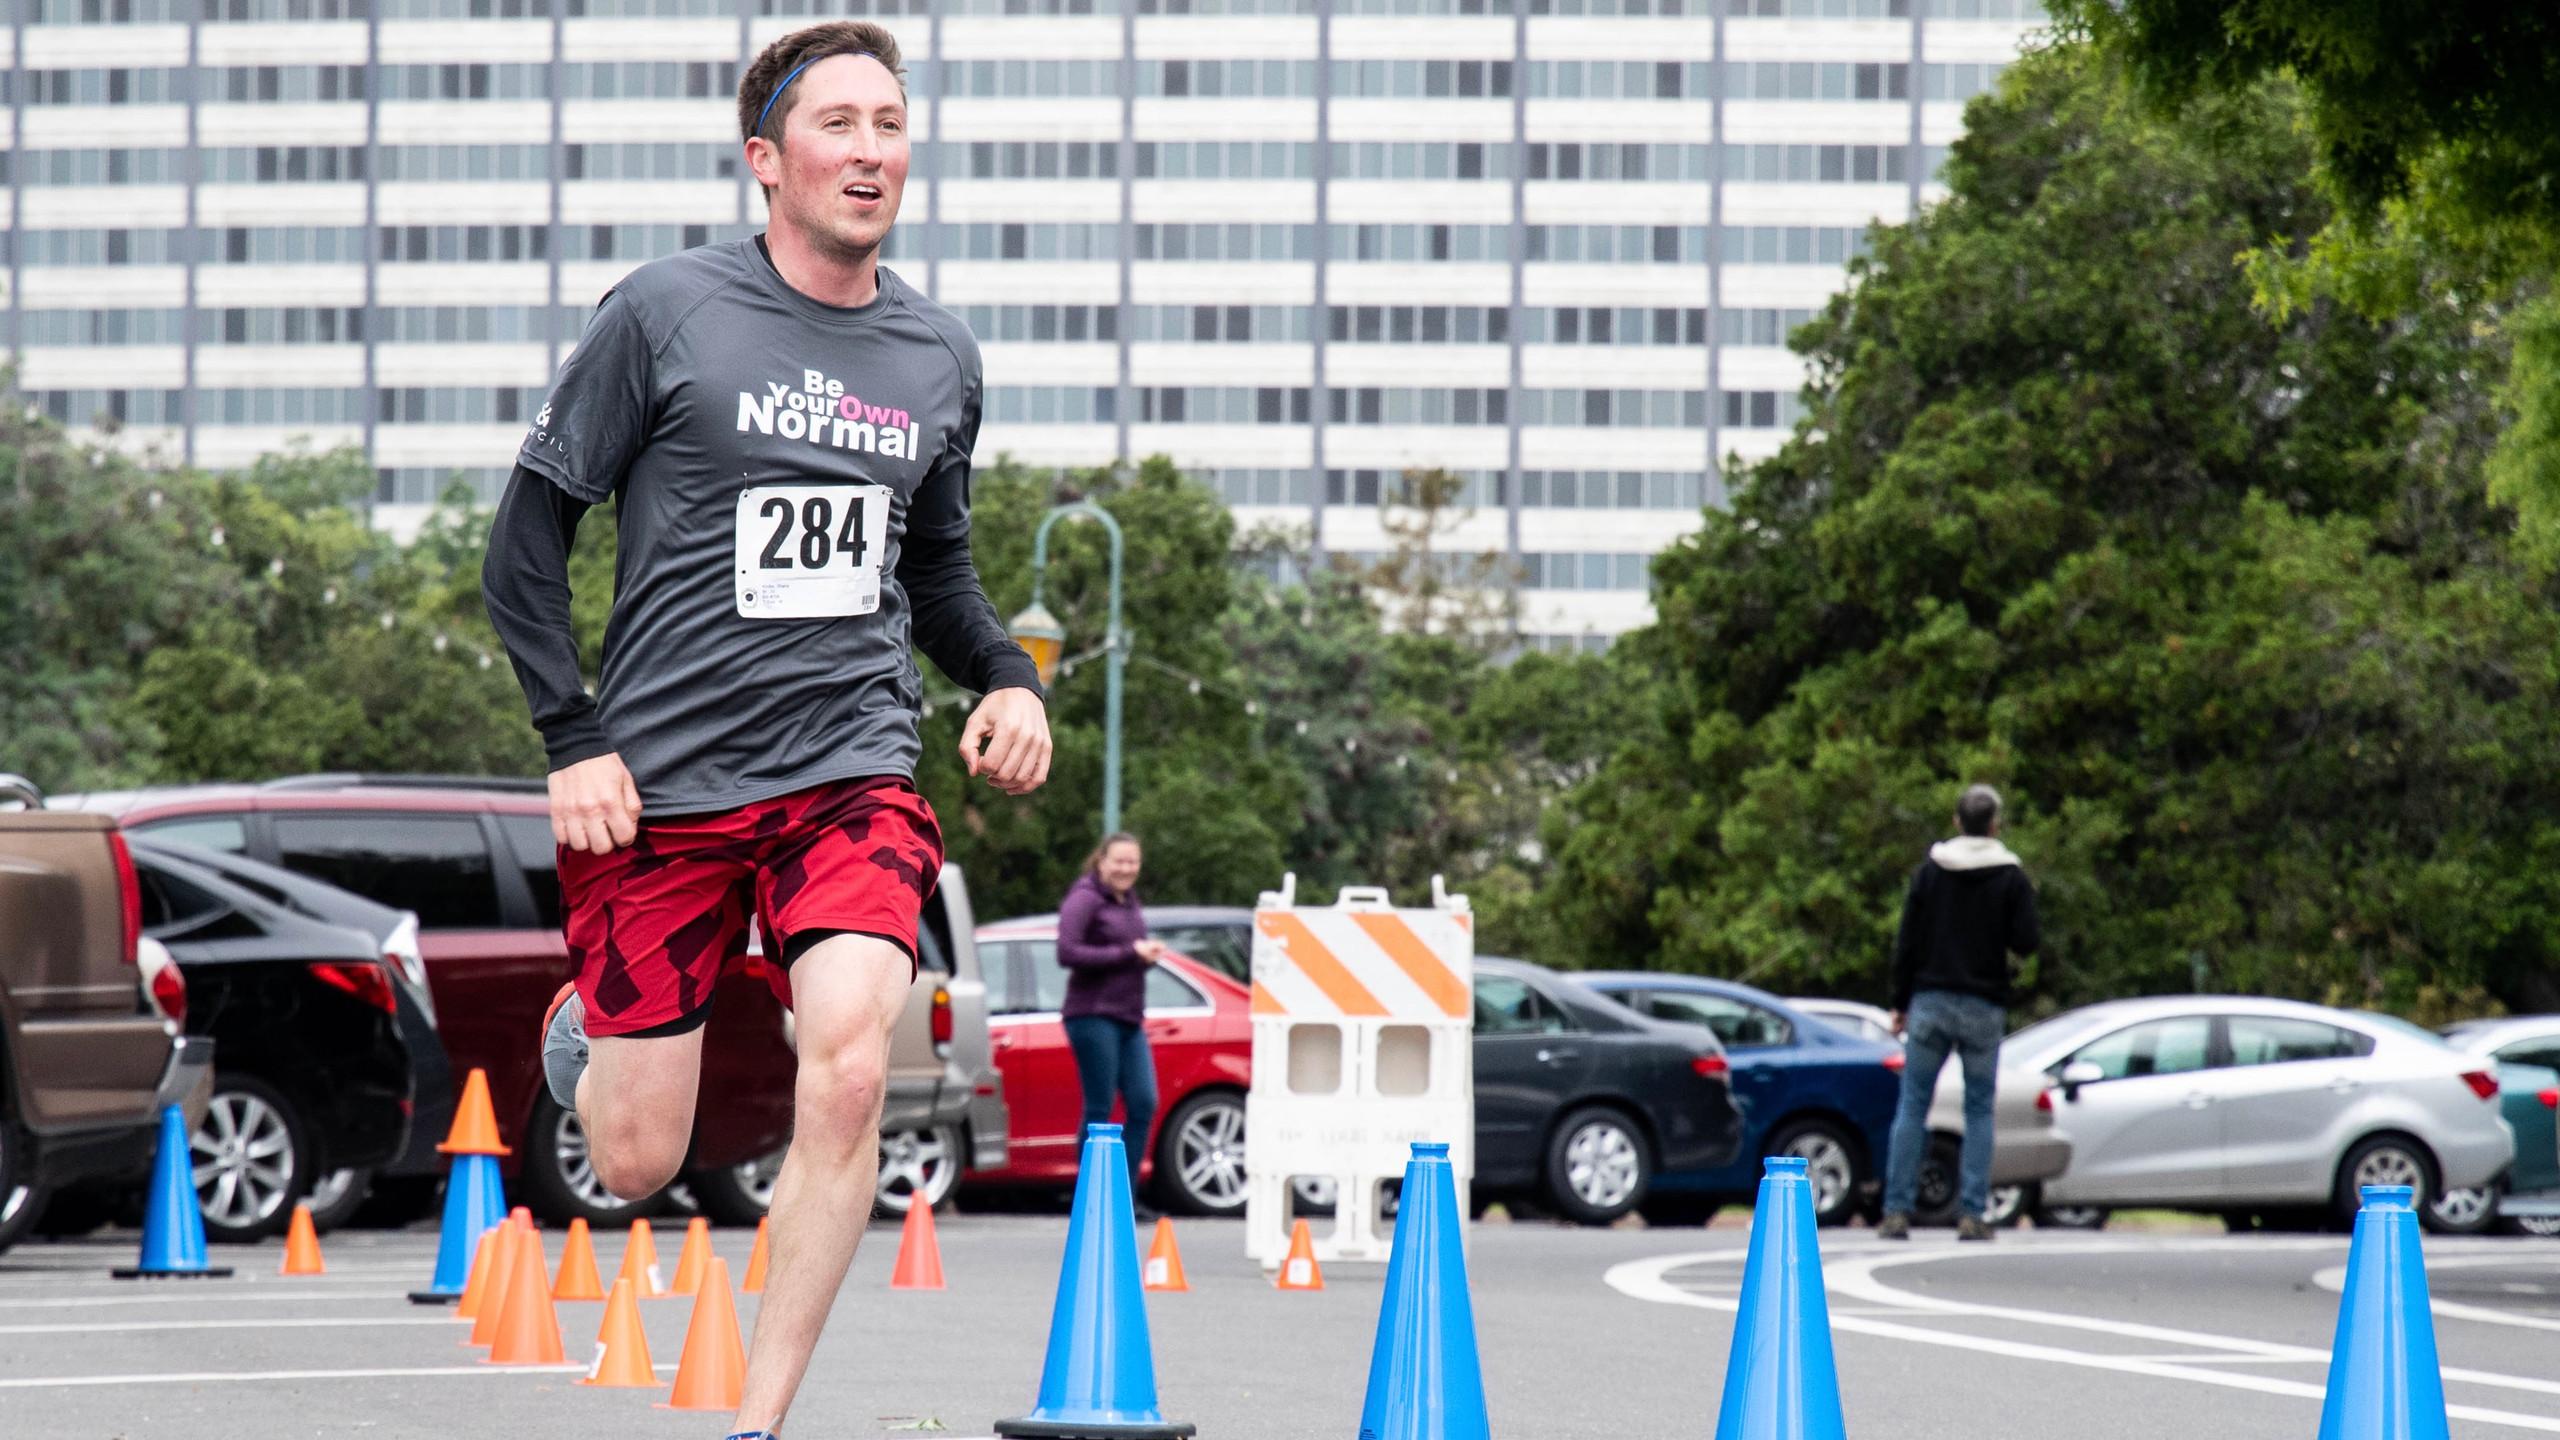 Man running in a race outside